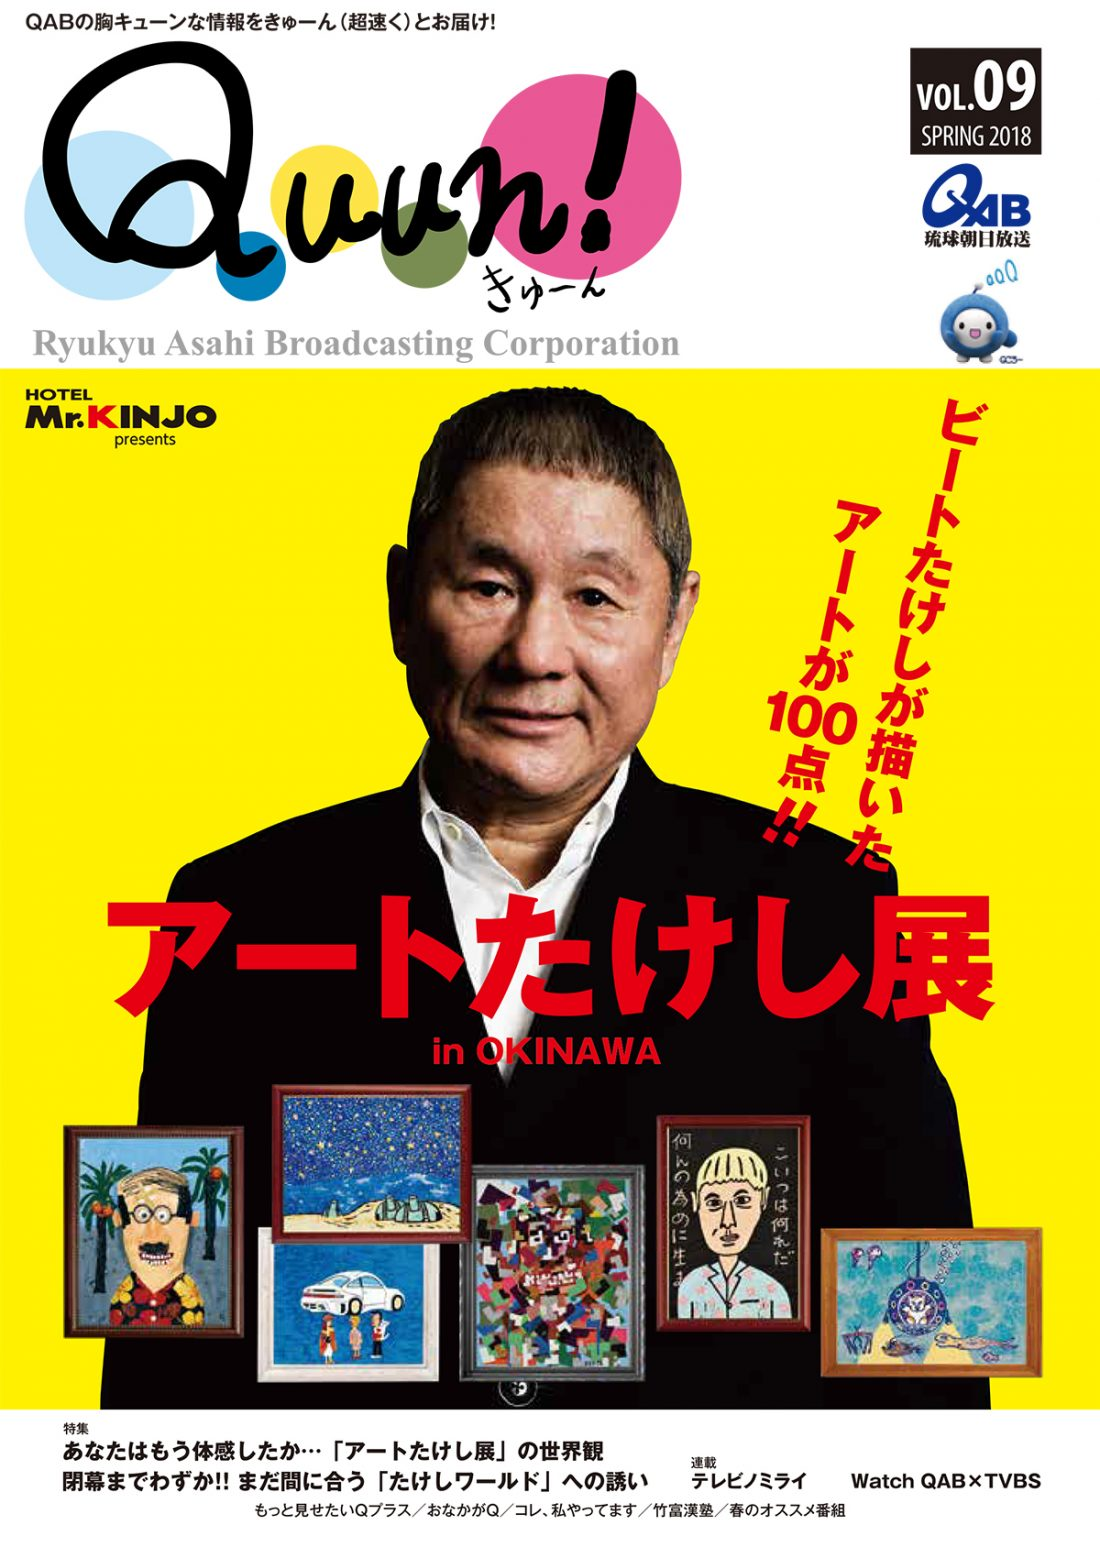 https://www.qab.co.jp/qgoro/wp-content/uploads/quun_0901-1100x1558.jpg